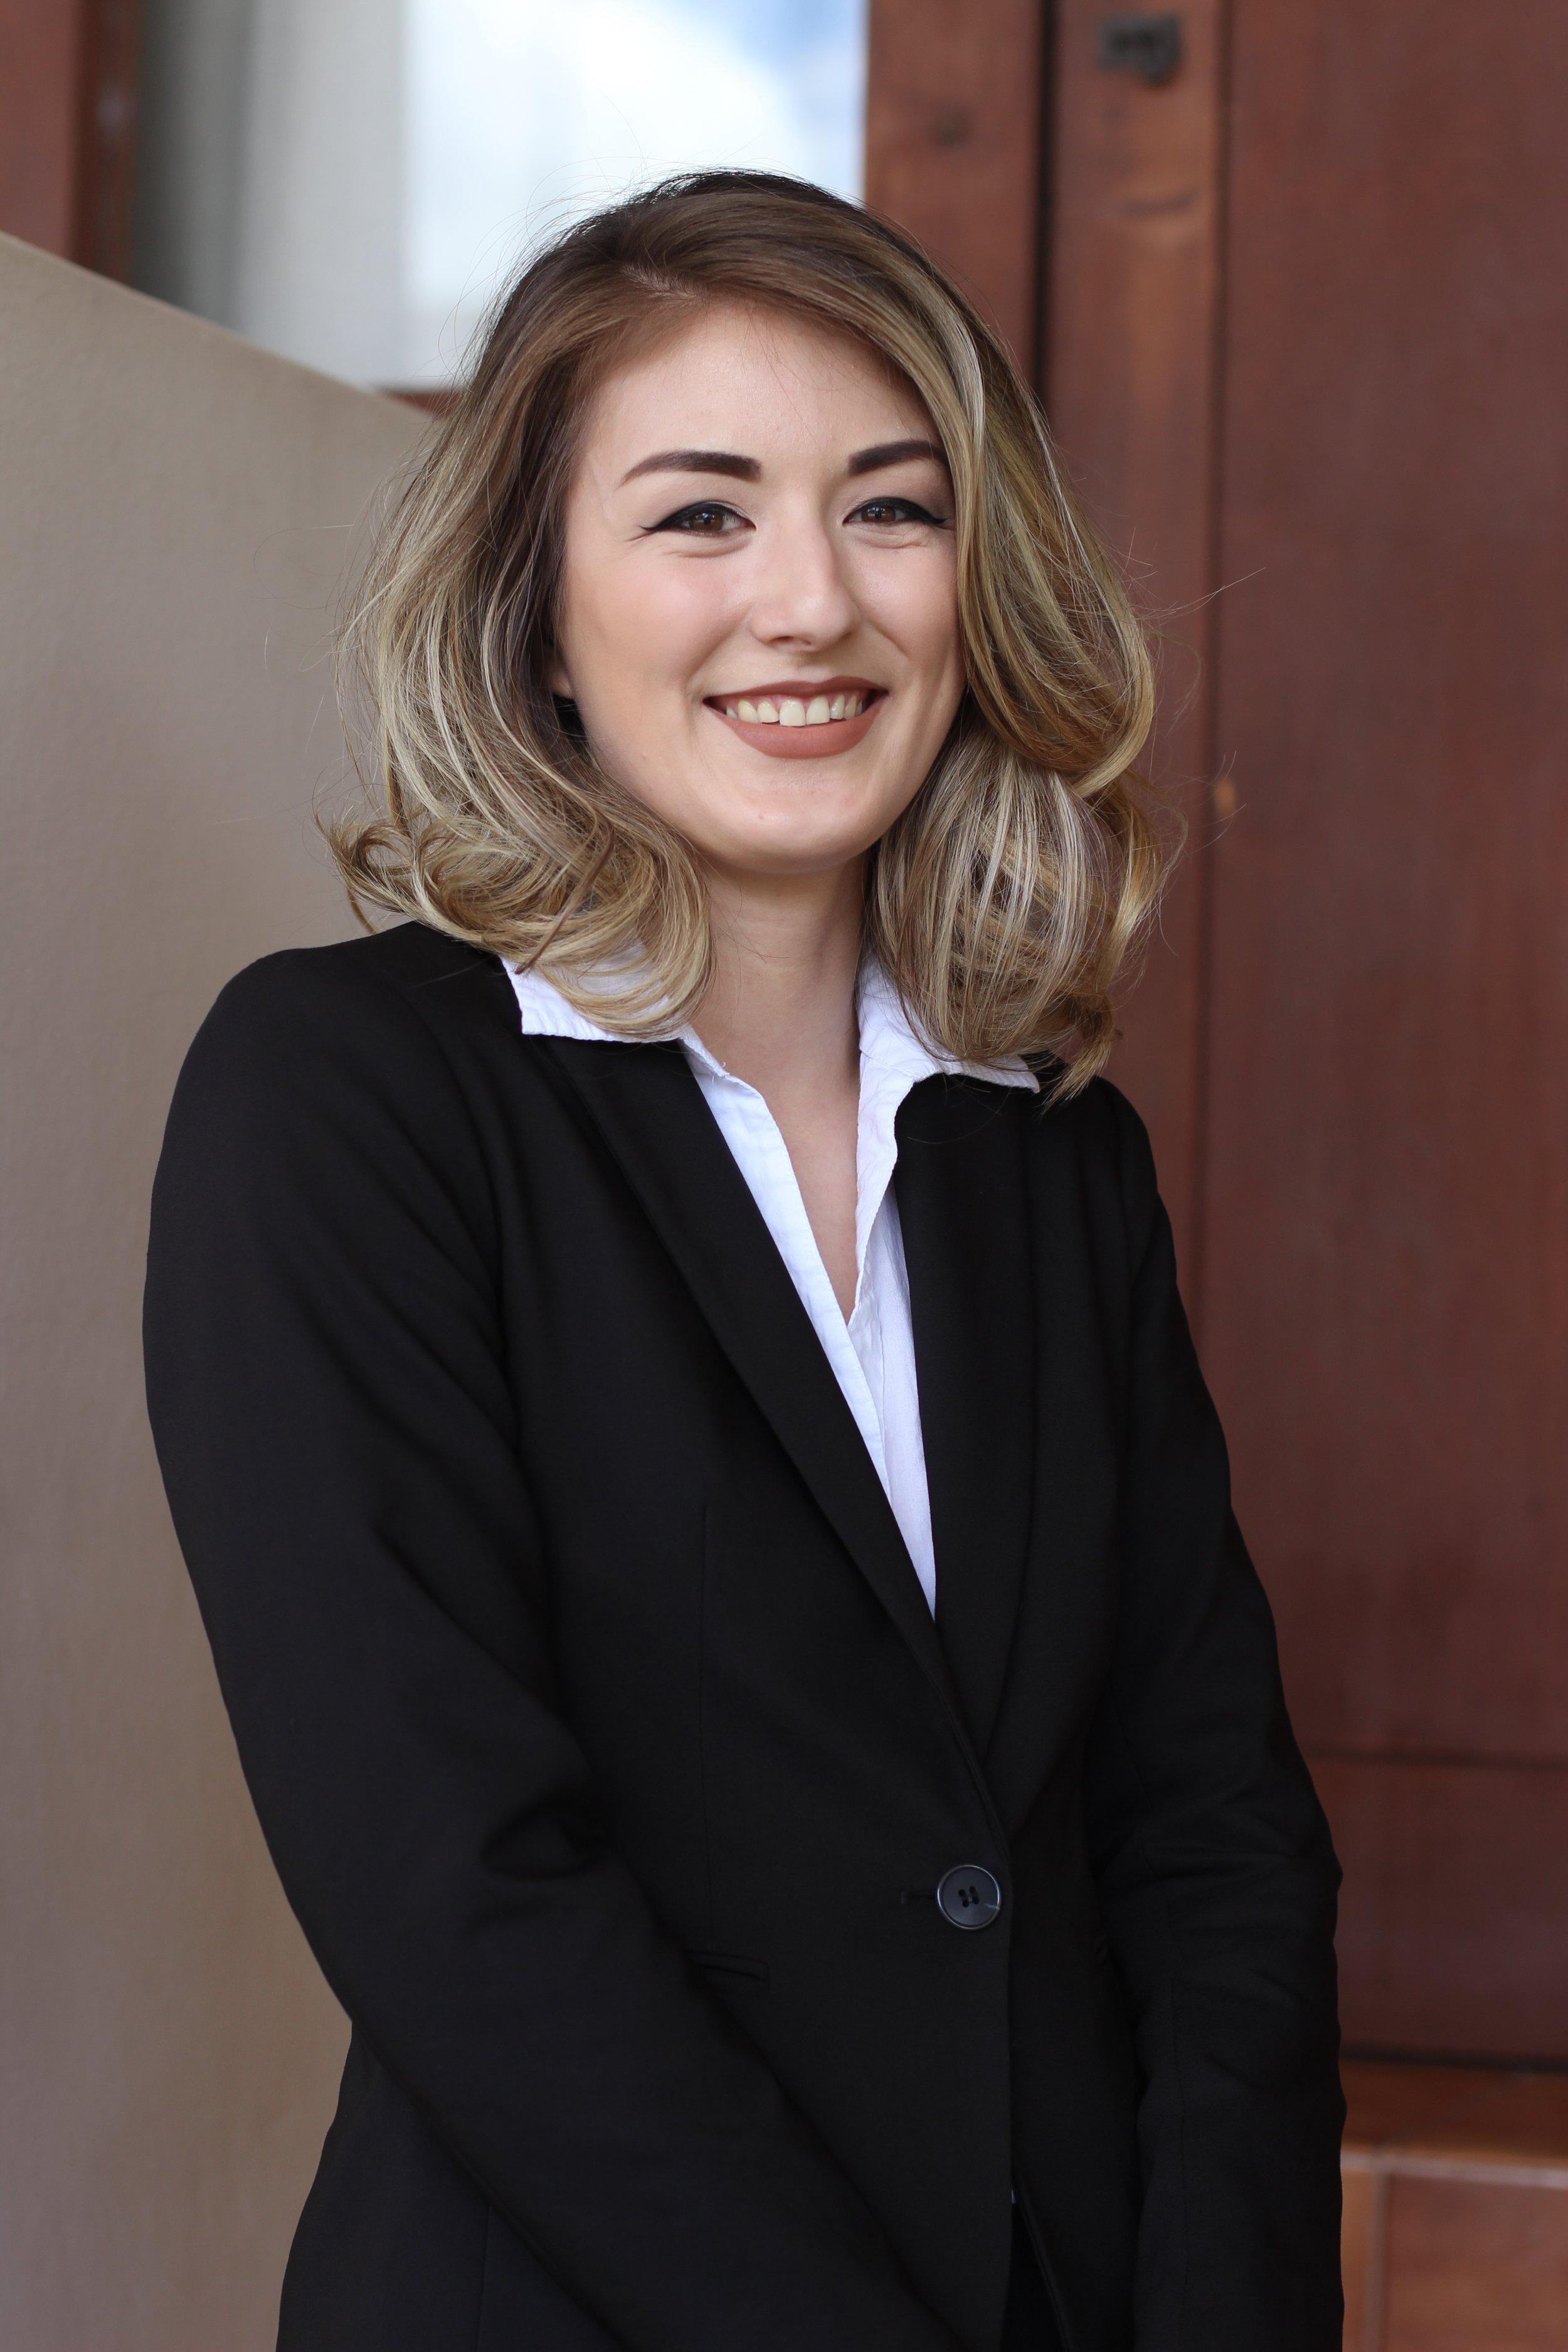 SECRETARY & IBC SENATOR: ALISSA KELLY -